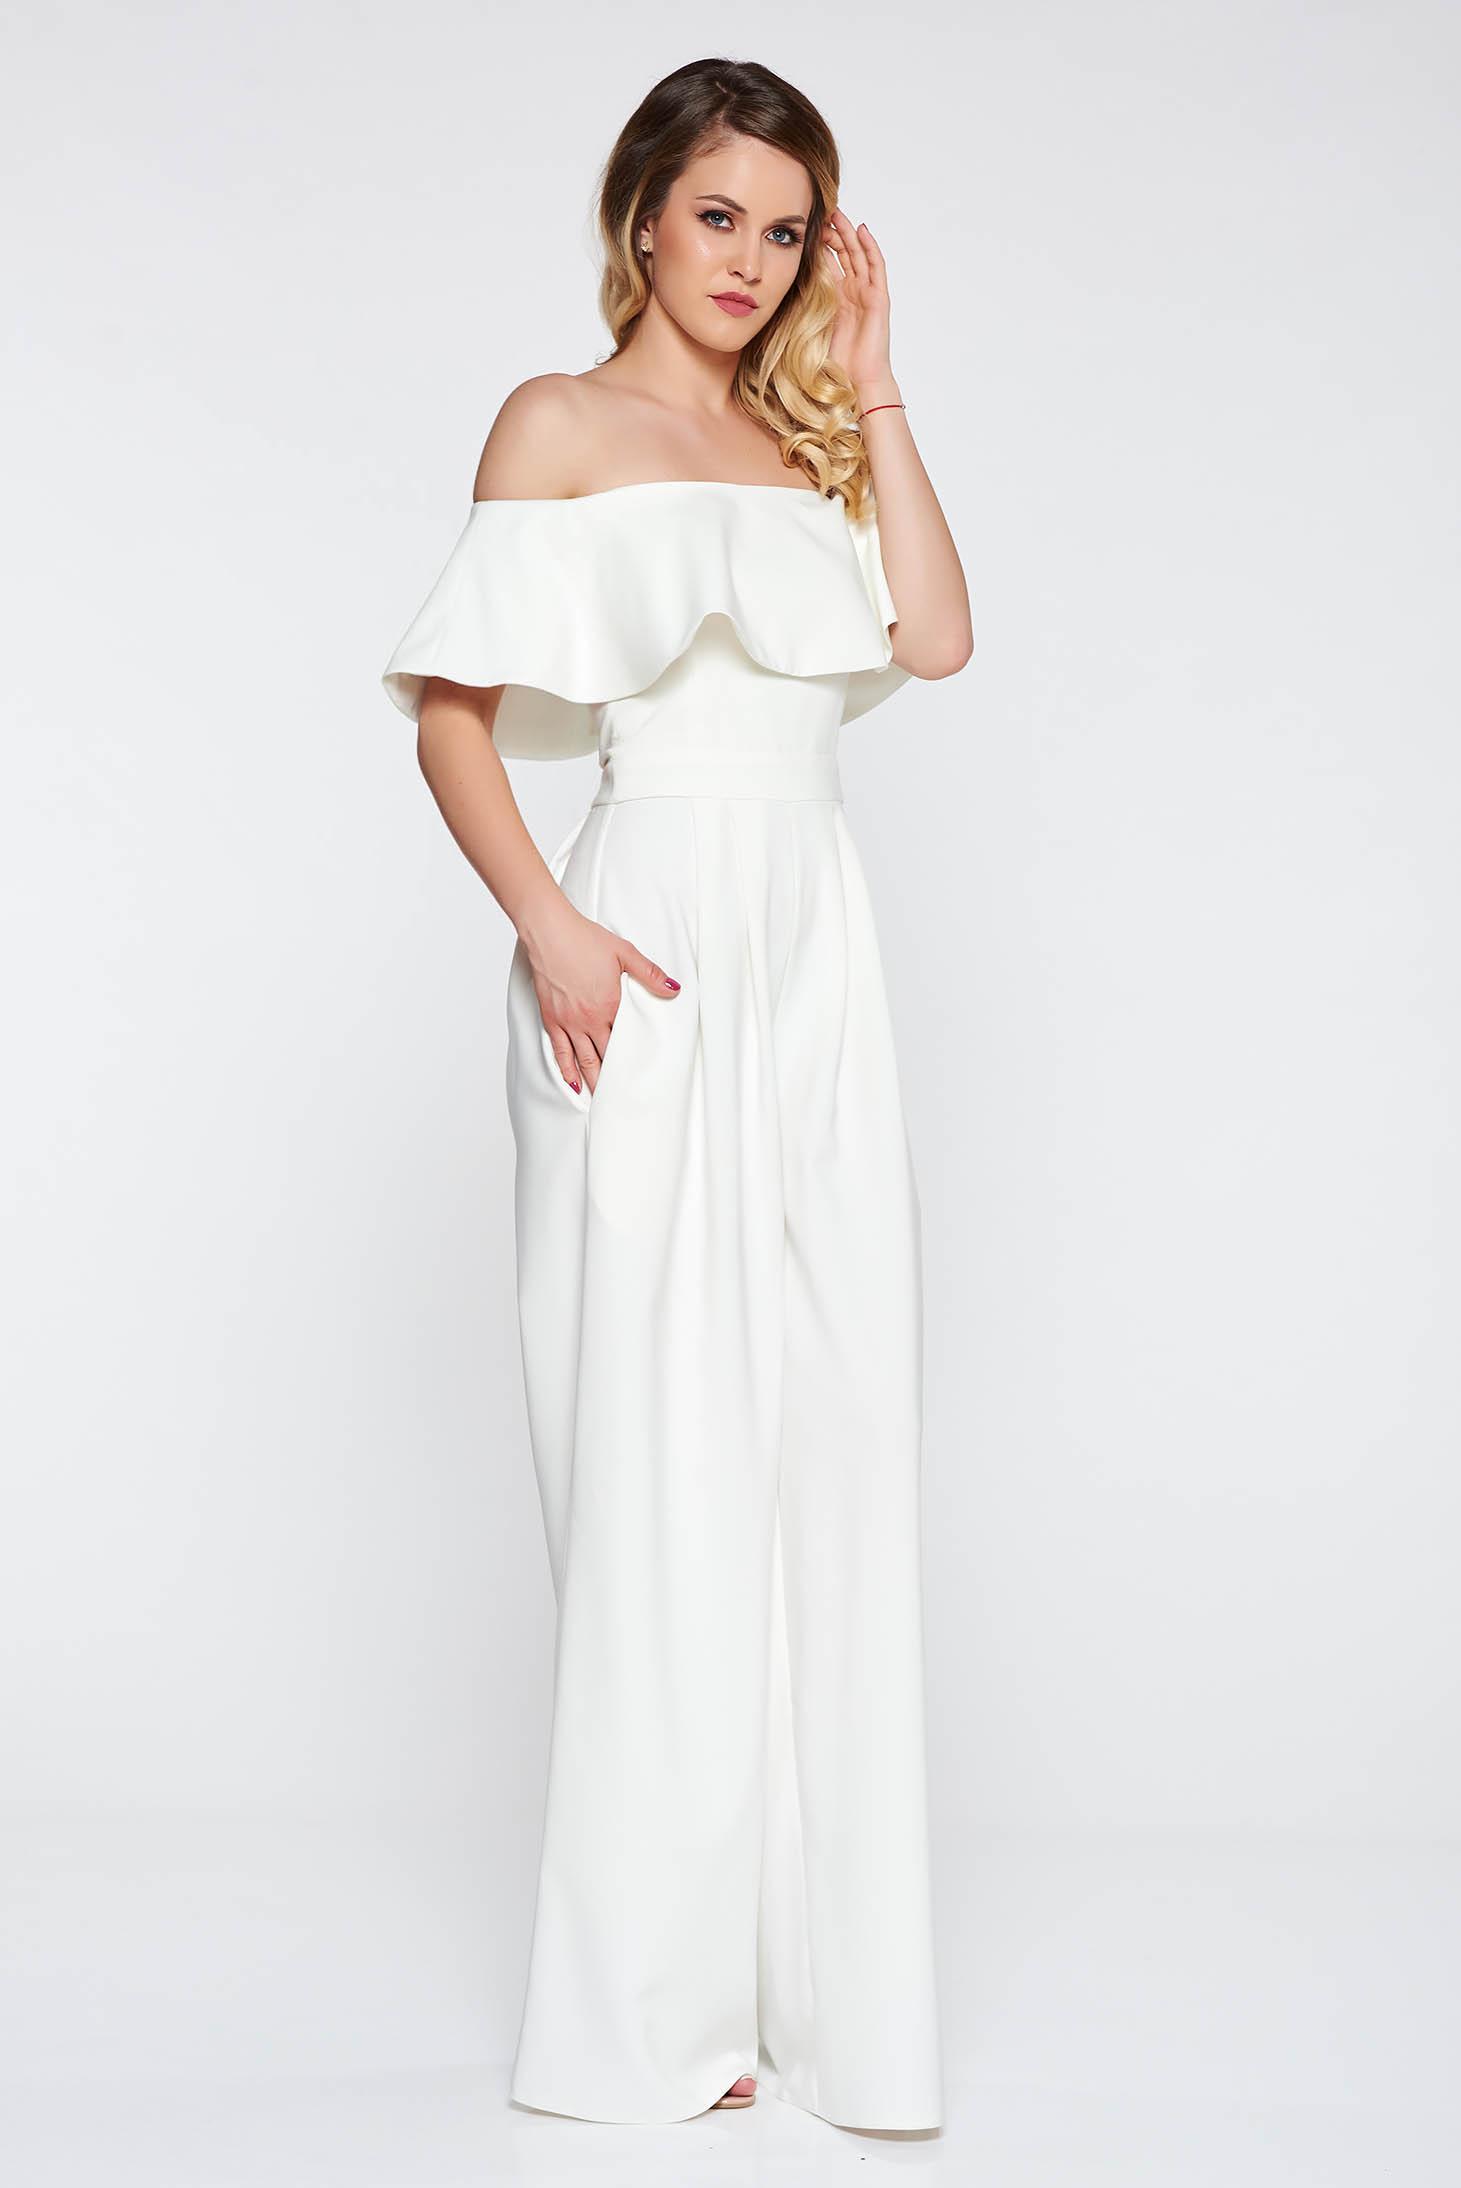 f32c123fe694 ladonna-white-occasional-jumpsuit-slightly-elastic-S037639-2-368322.jpg